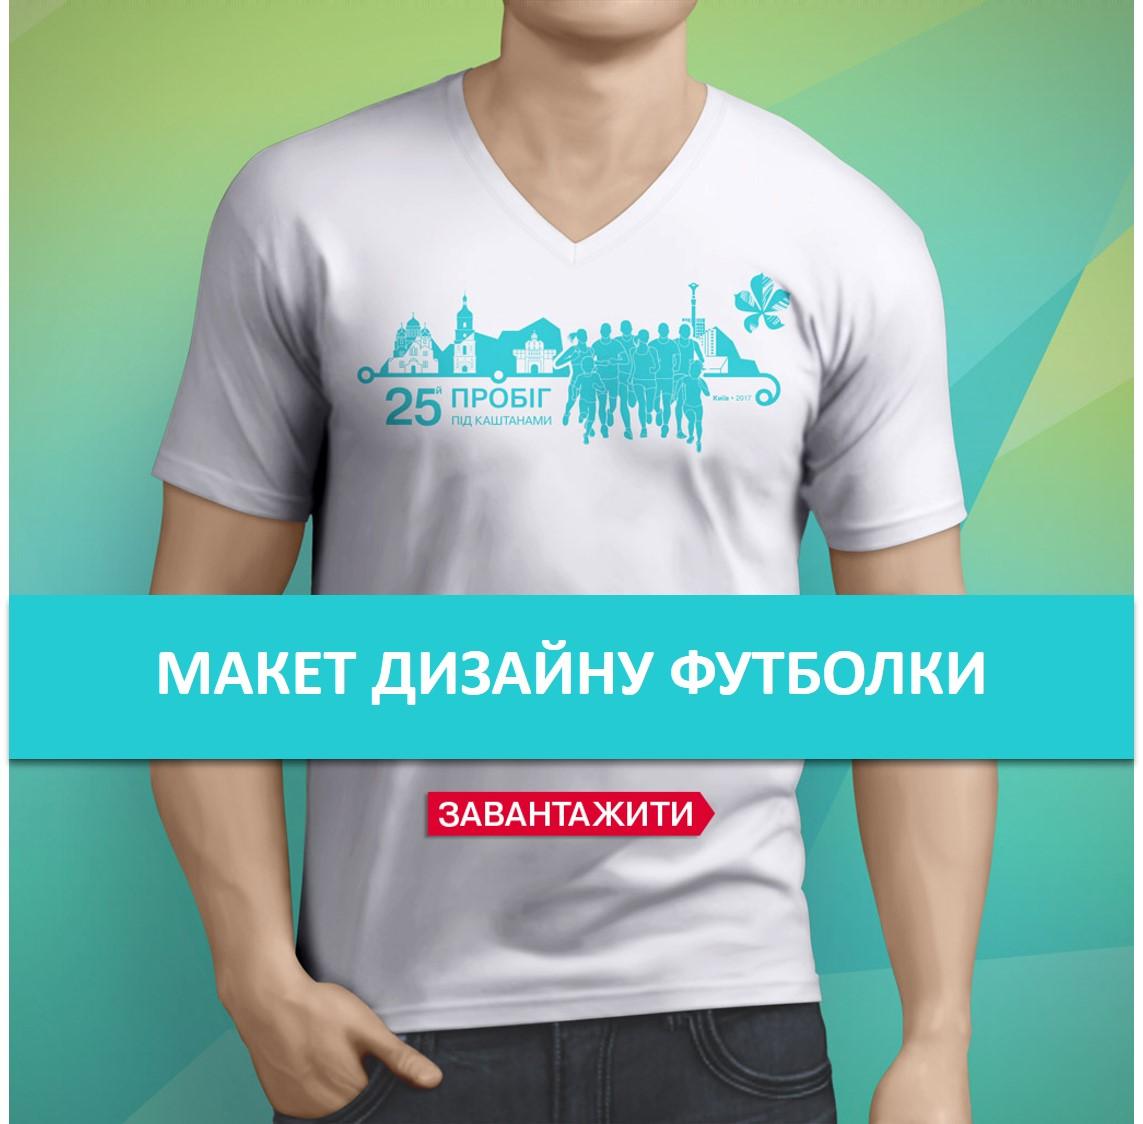 Макеты дизайн футболок